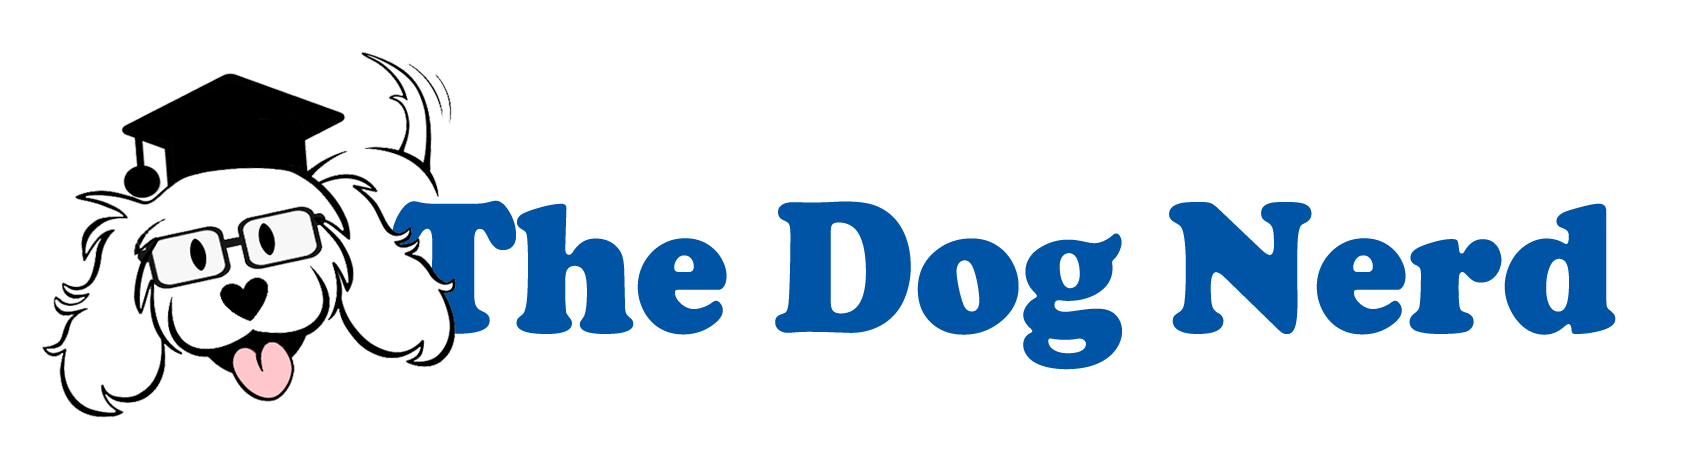 The Dog Nerd